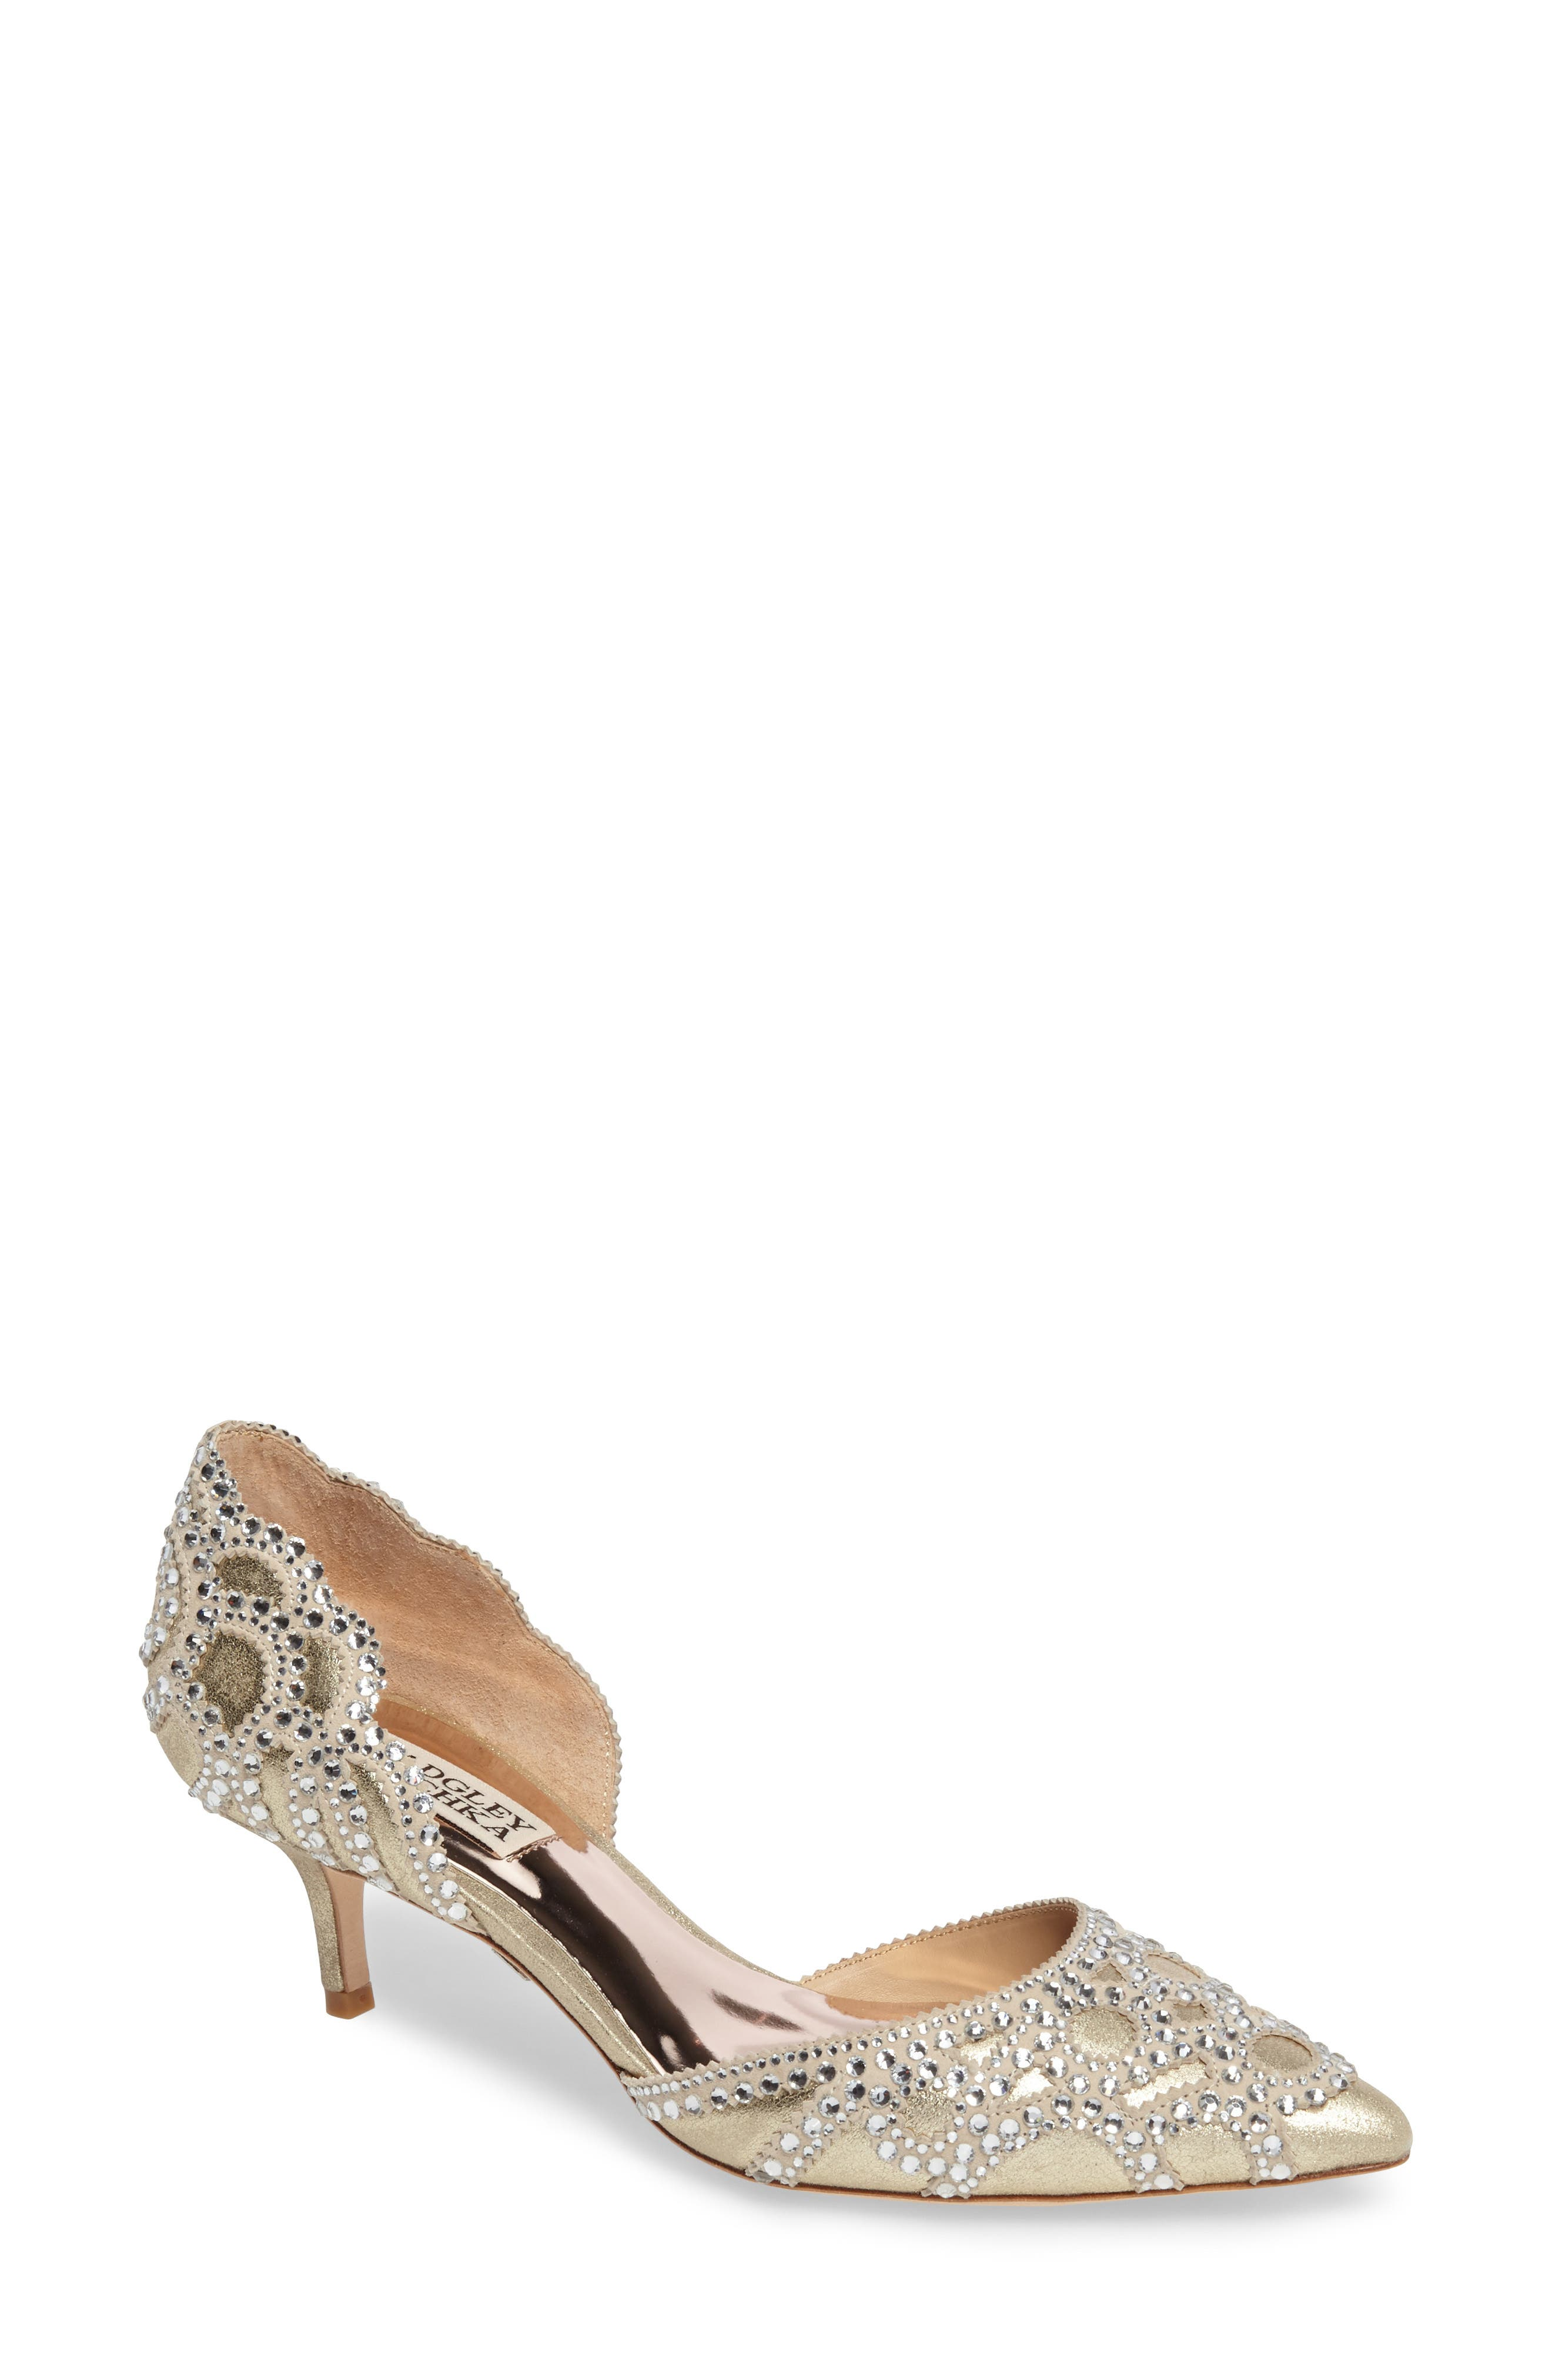 Badgley Mischka Ginny D'Orsay Kitten Heels Women's Shoes wJLeNWv7Dq